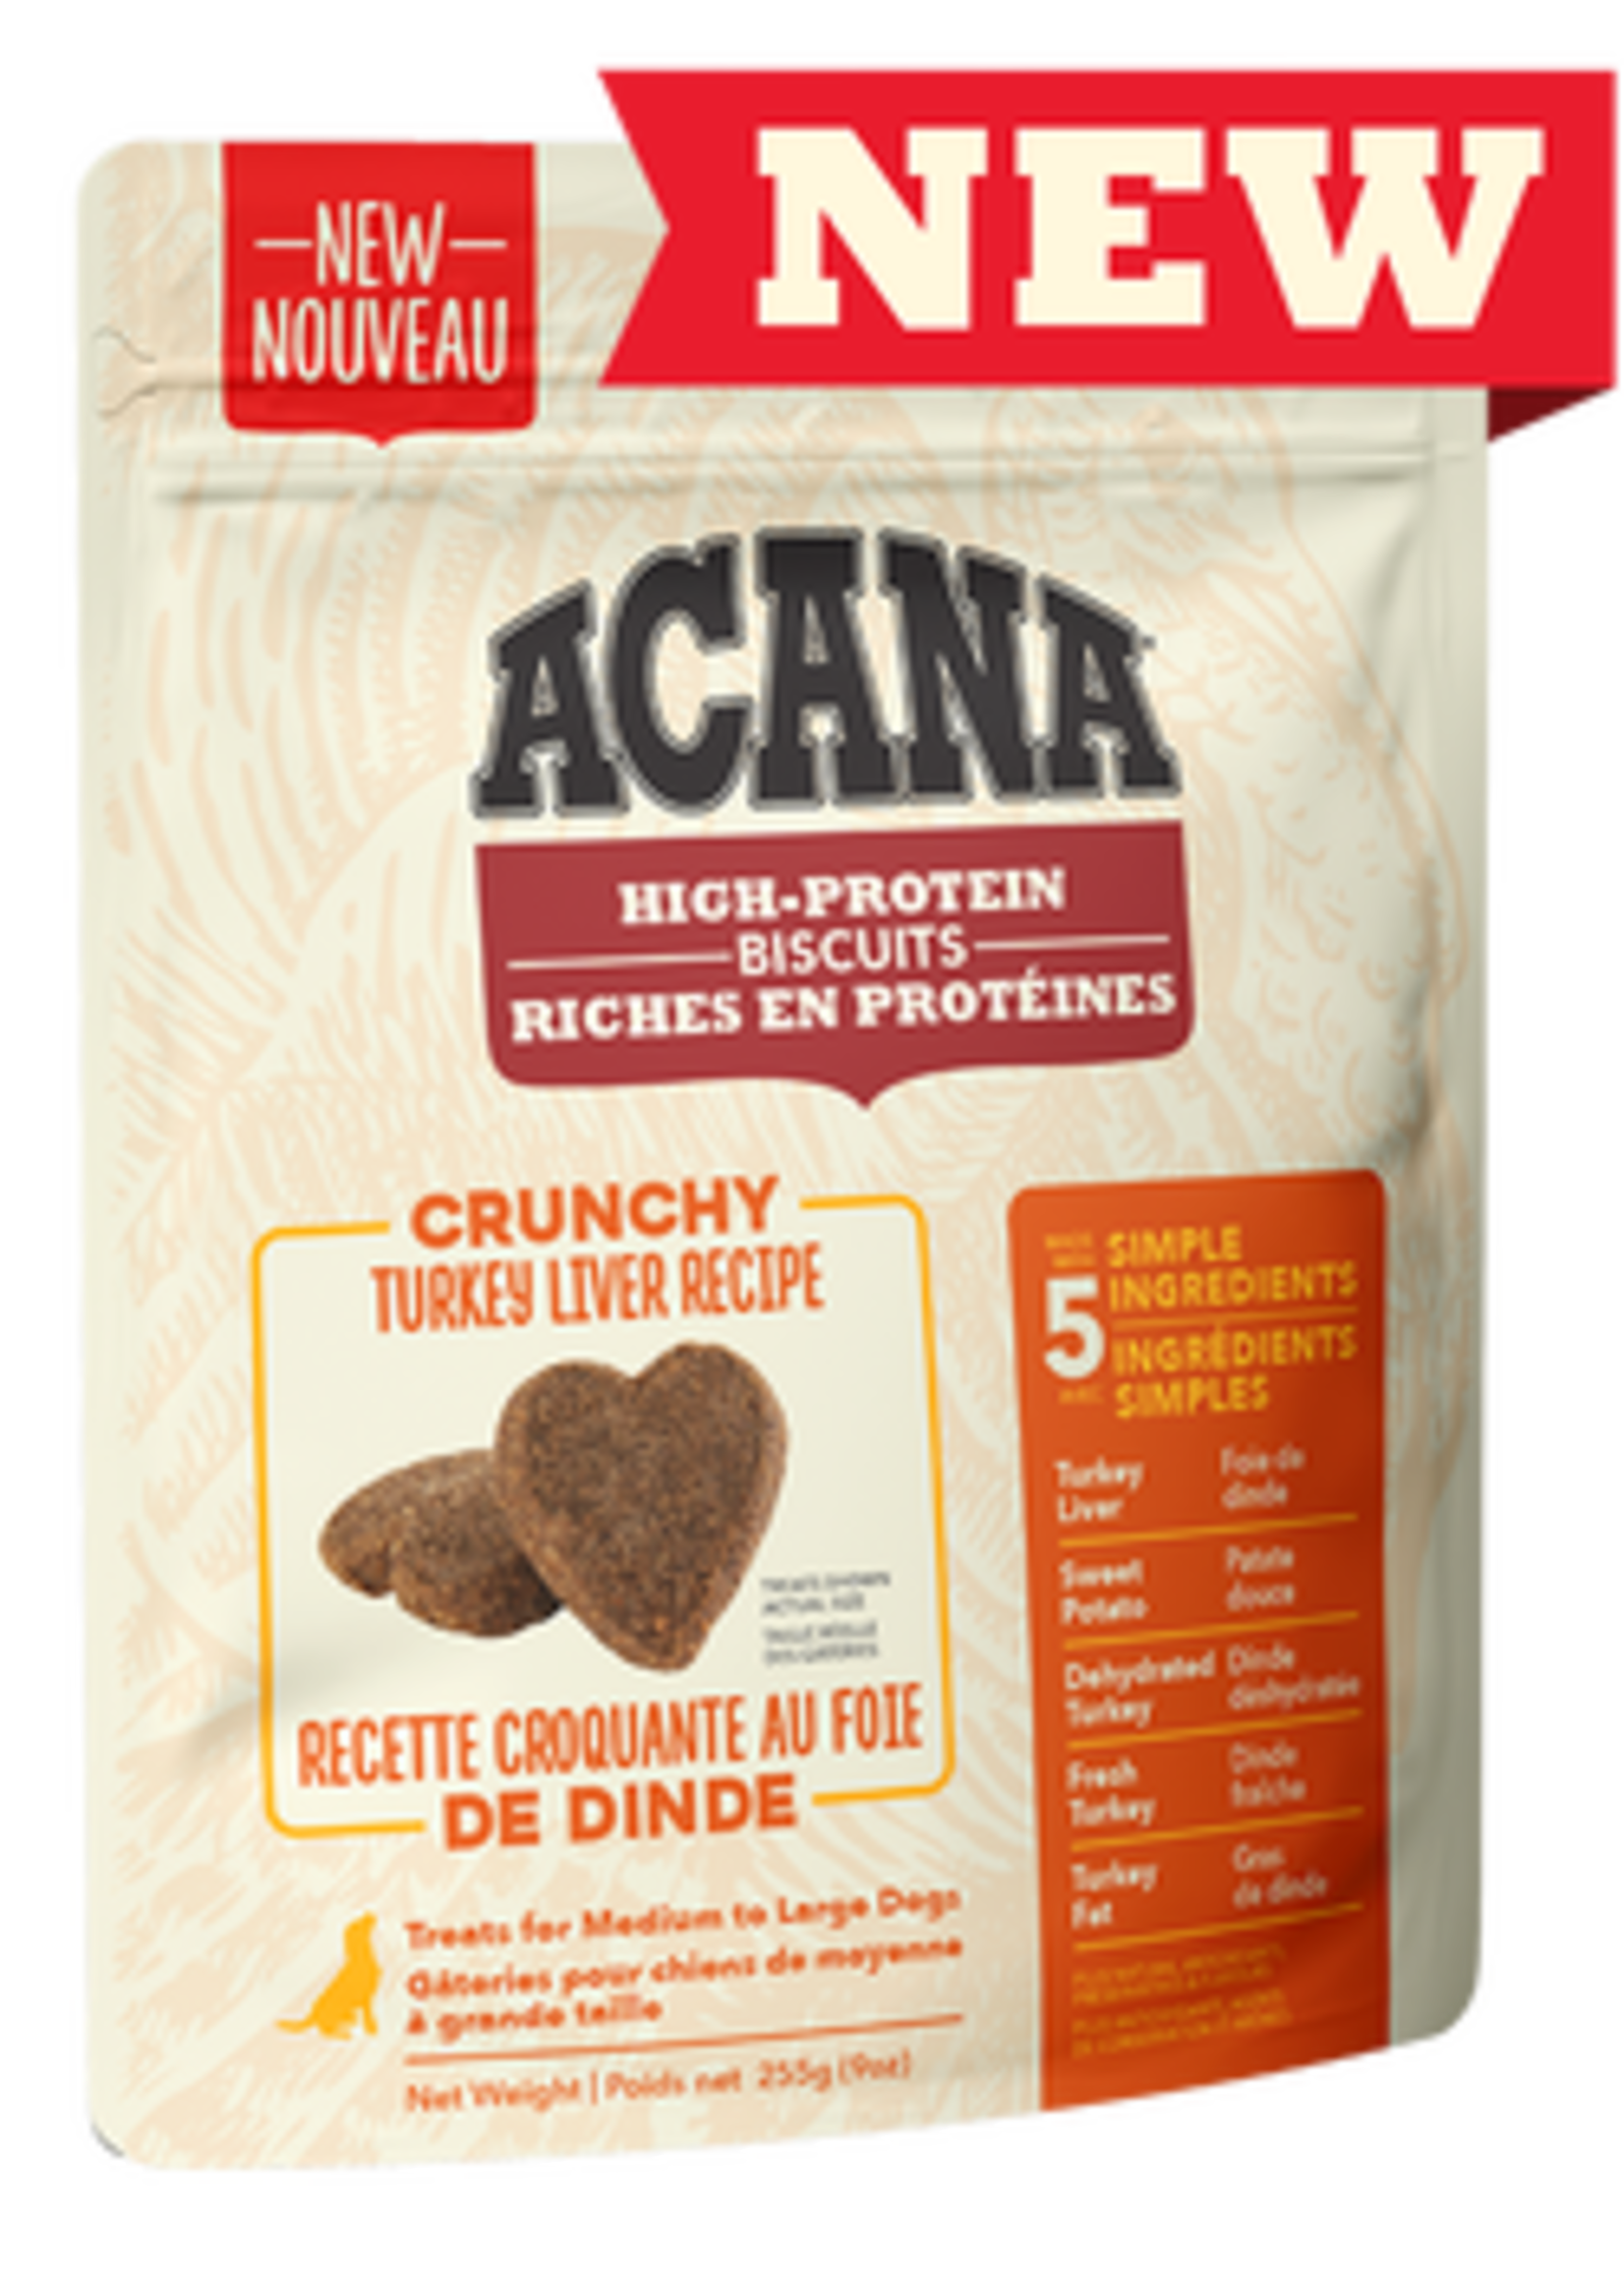 Acana® Acana High-Protein Biscuits, Crunchy Turkey Liver Recipe 9oz